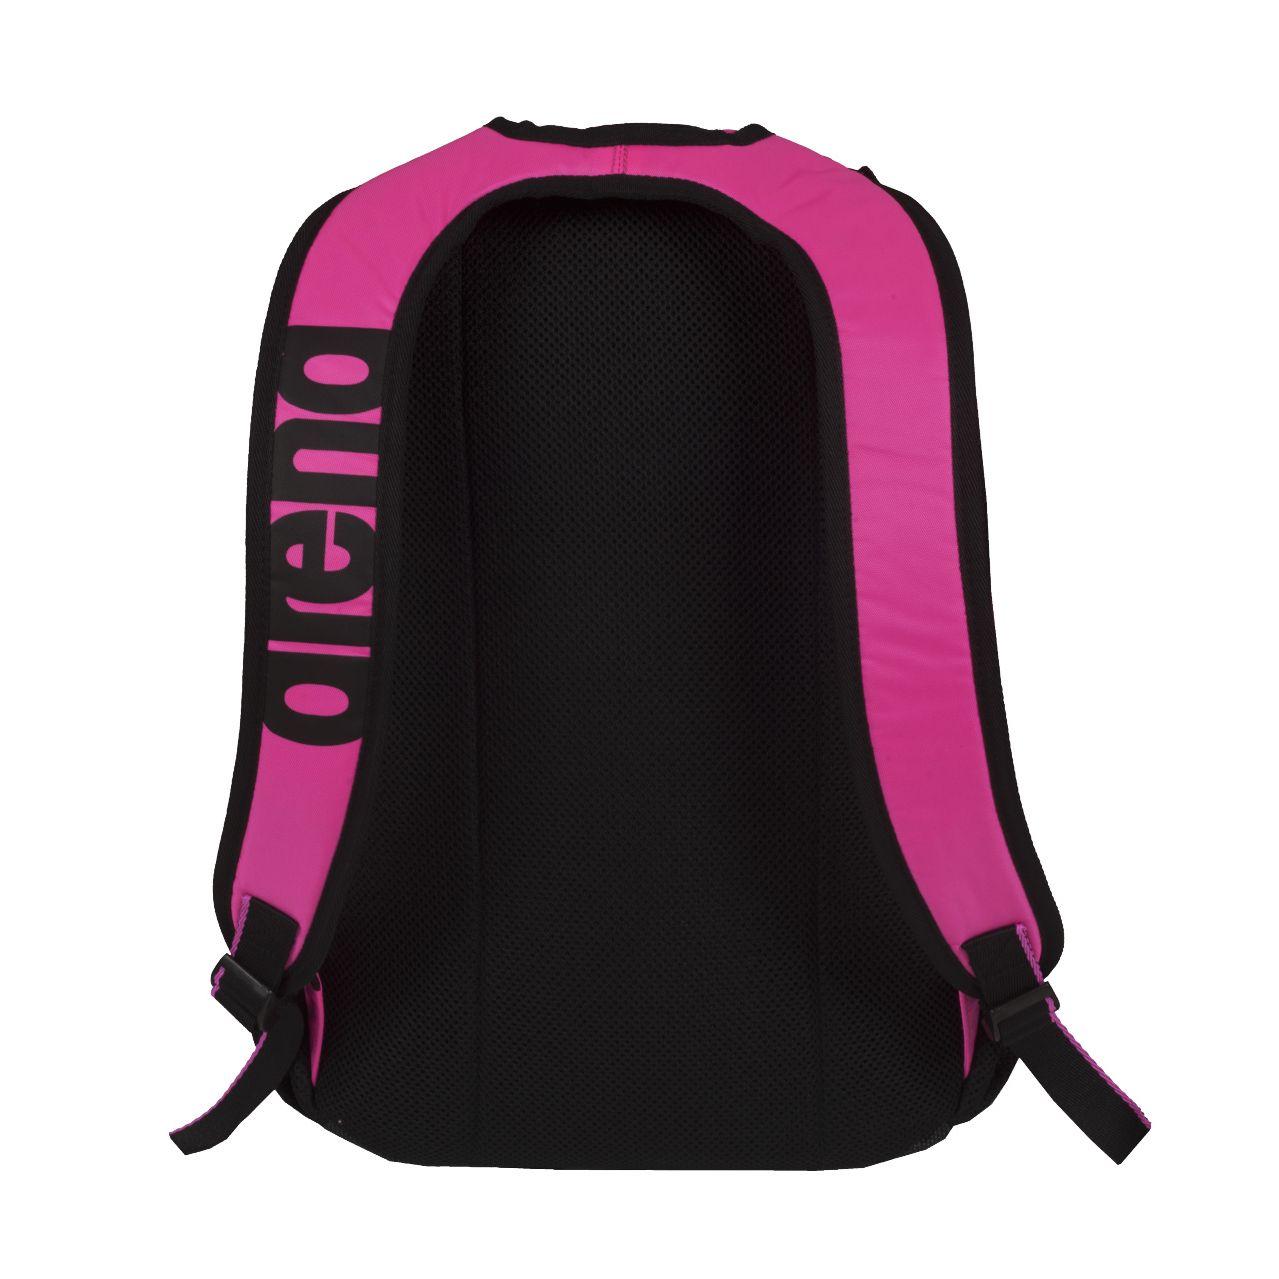 Mochila arena Spiky2 Backpack_6875